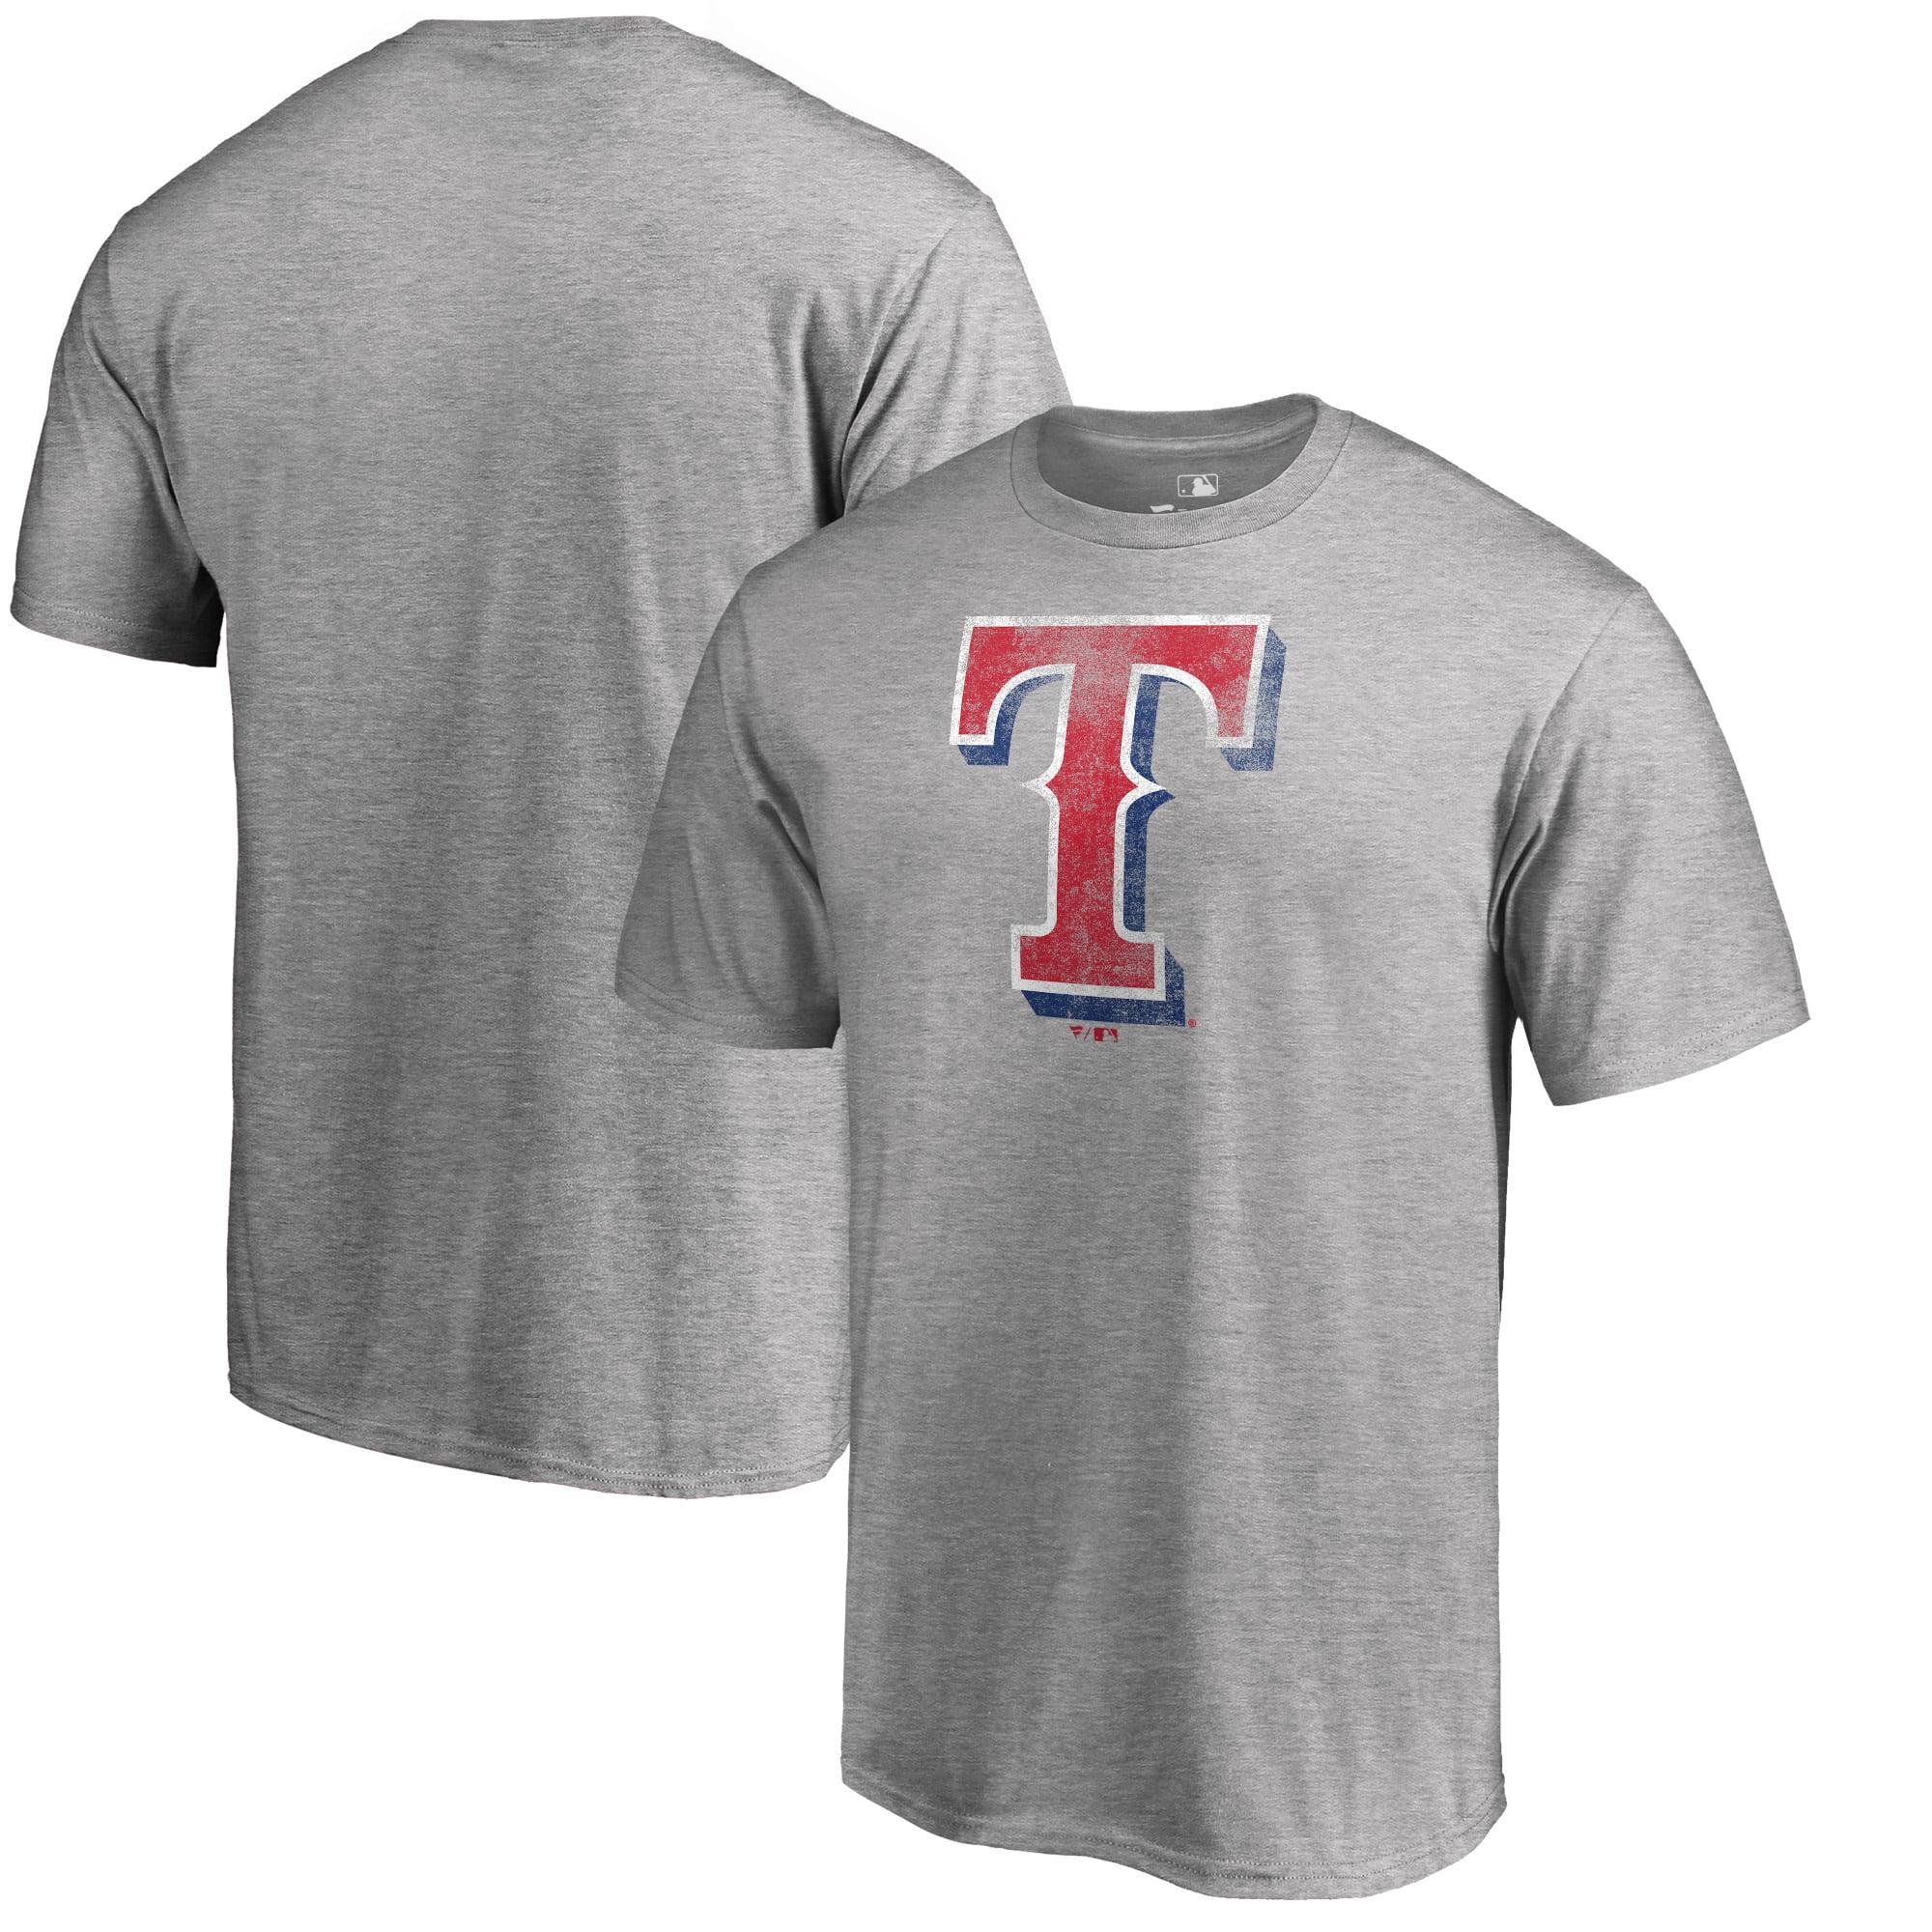 Texas Rangers Fanatics Branded Big & Tall Distressed Team T-Shirt - Heathered Gray